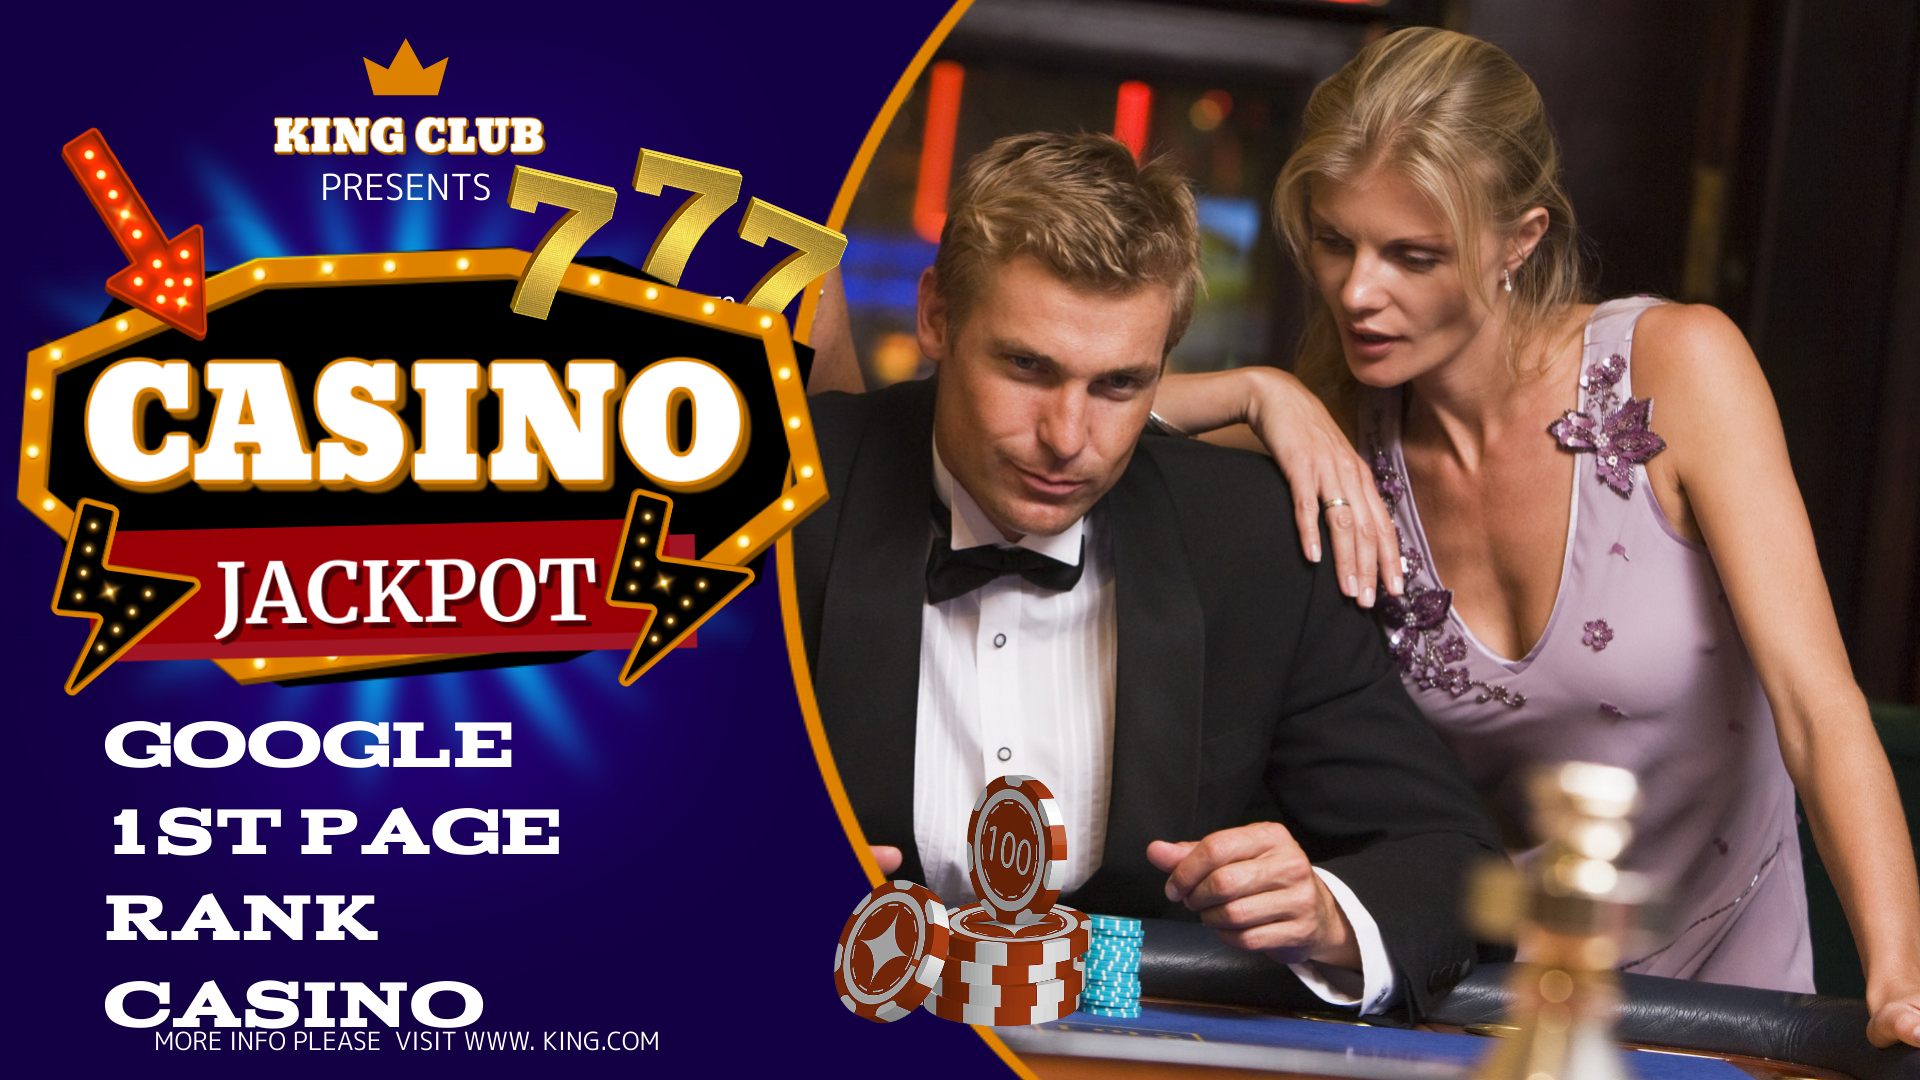 Casino Jackpot Gambling Sites Rank Guaranteed Thailand Cambodia Indonesian Singapore Vietnam Japan